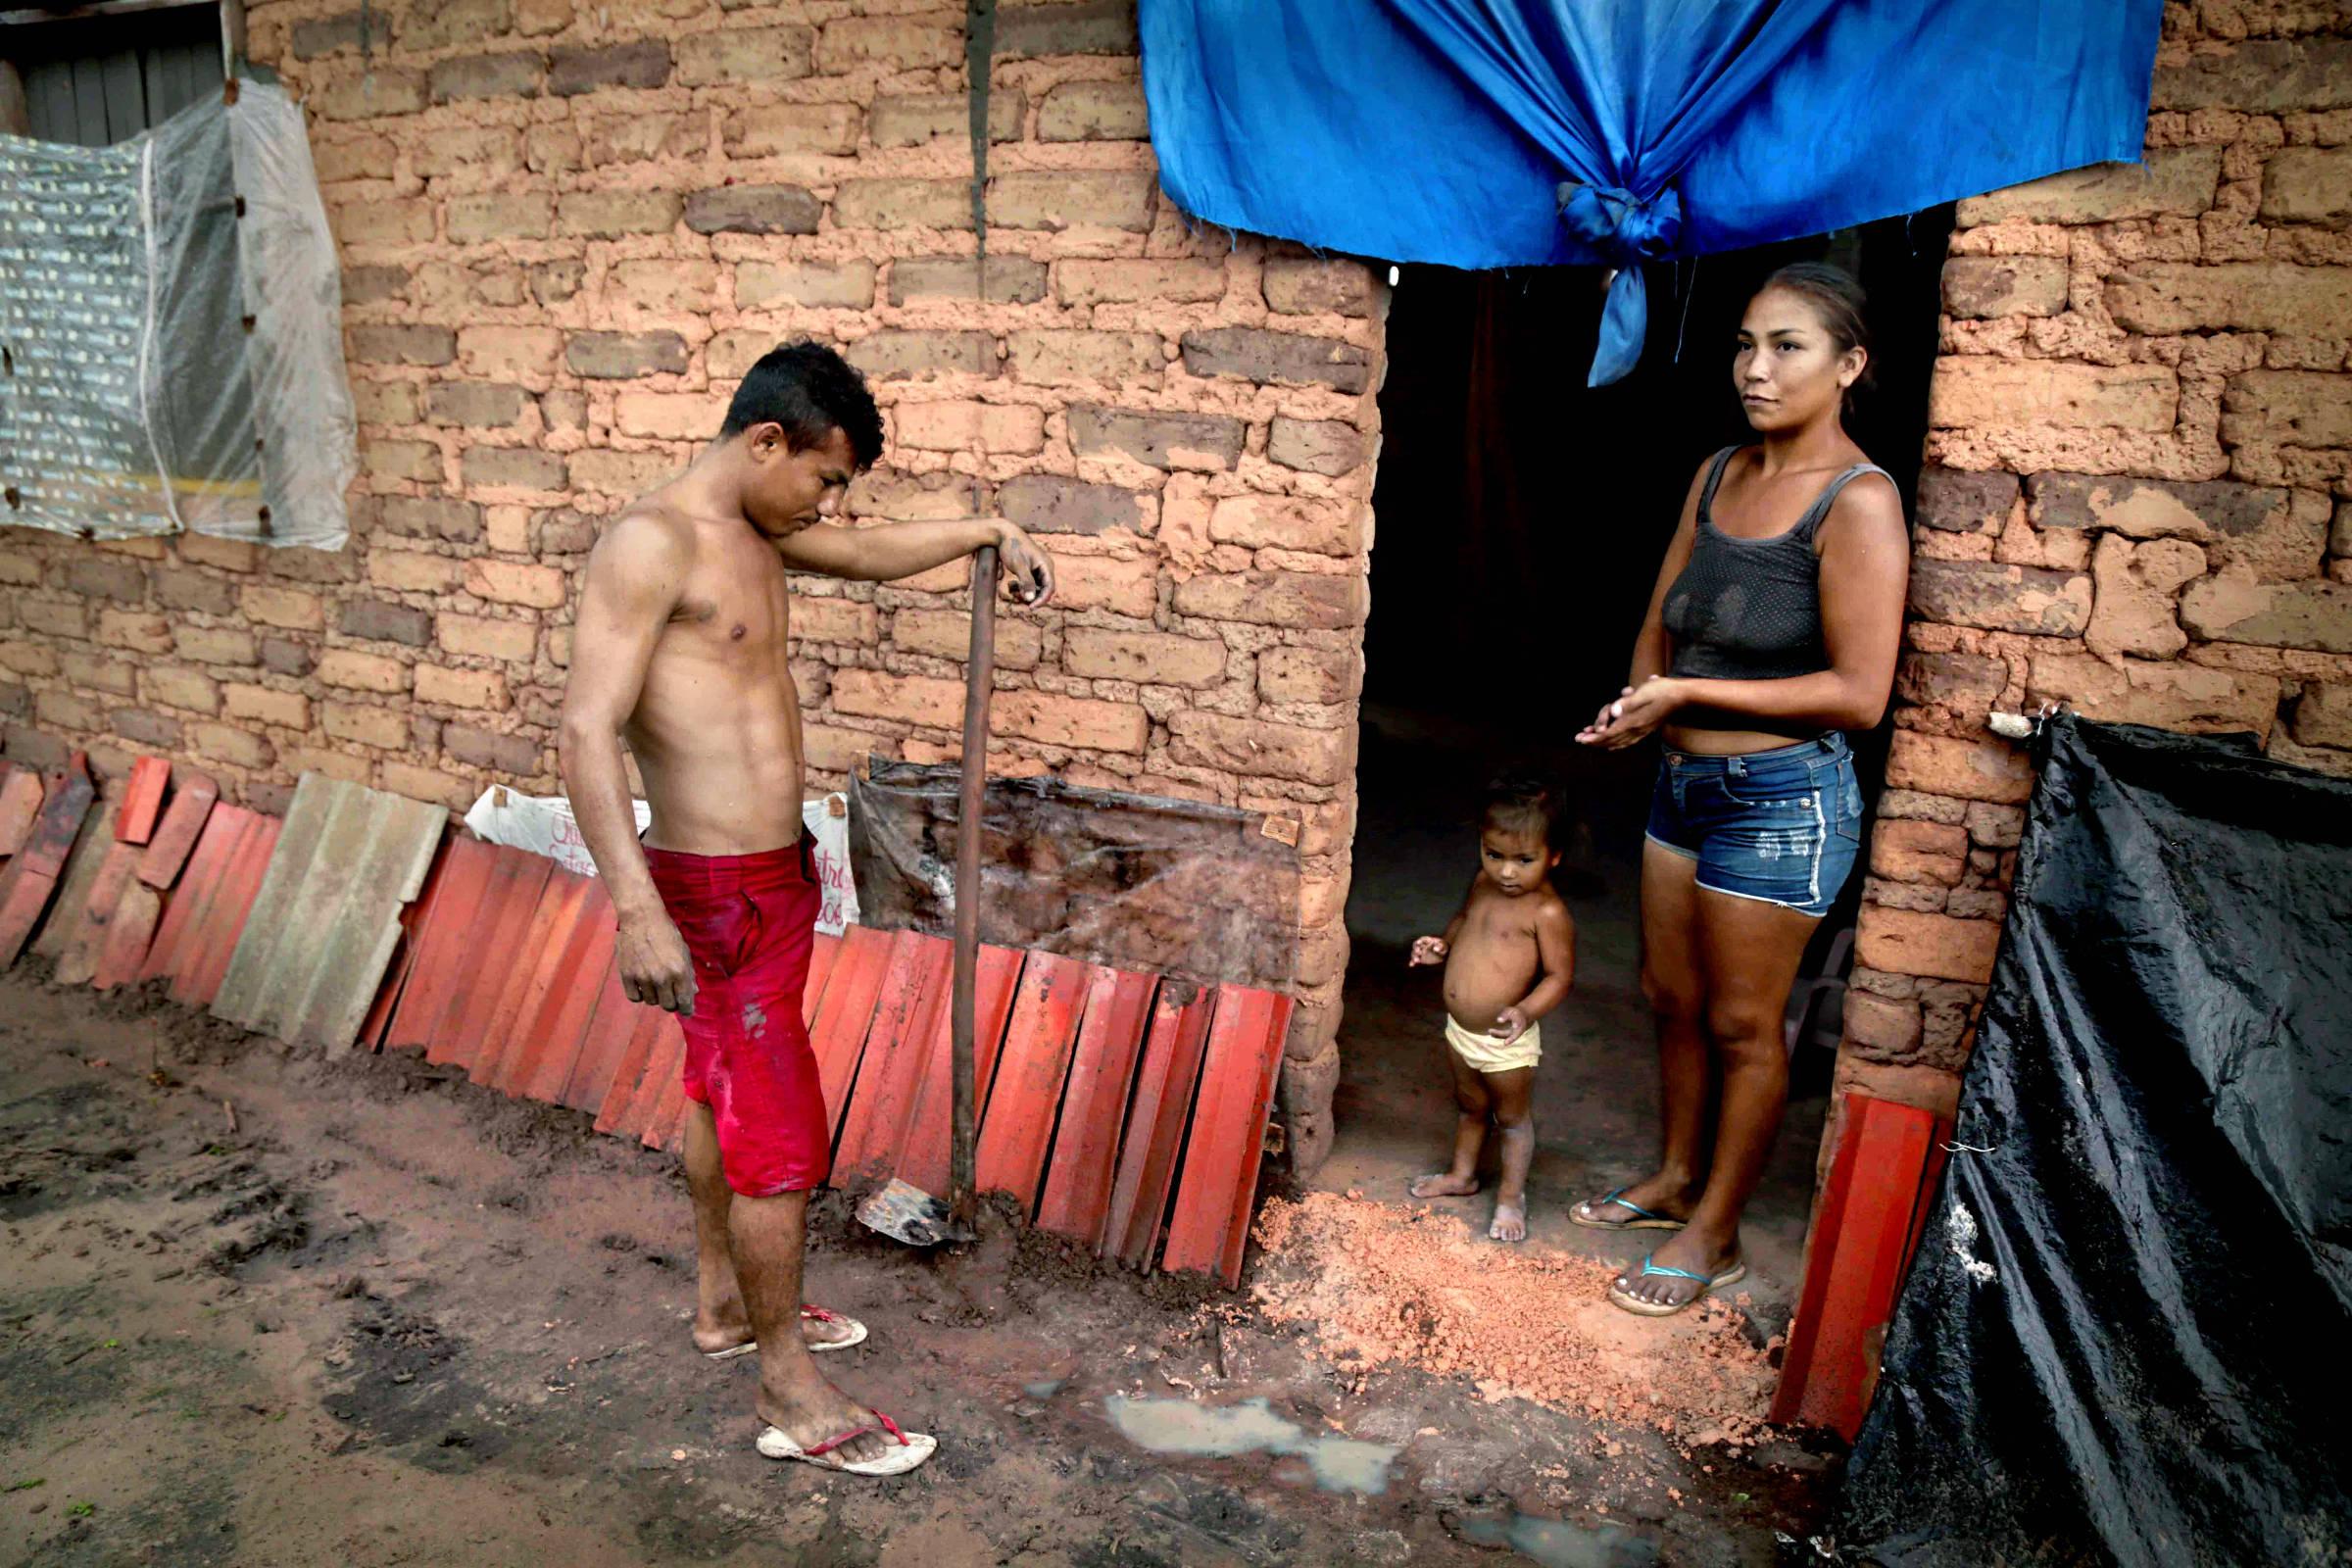 O novo imposto pode pagar até 40 bilhões de dólares do programa social Bolsonaroa - 31/07/2020 - Mercado